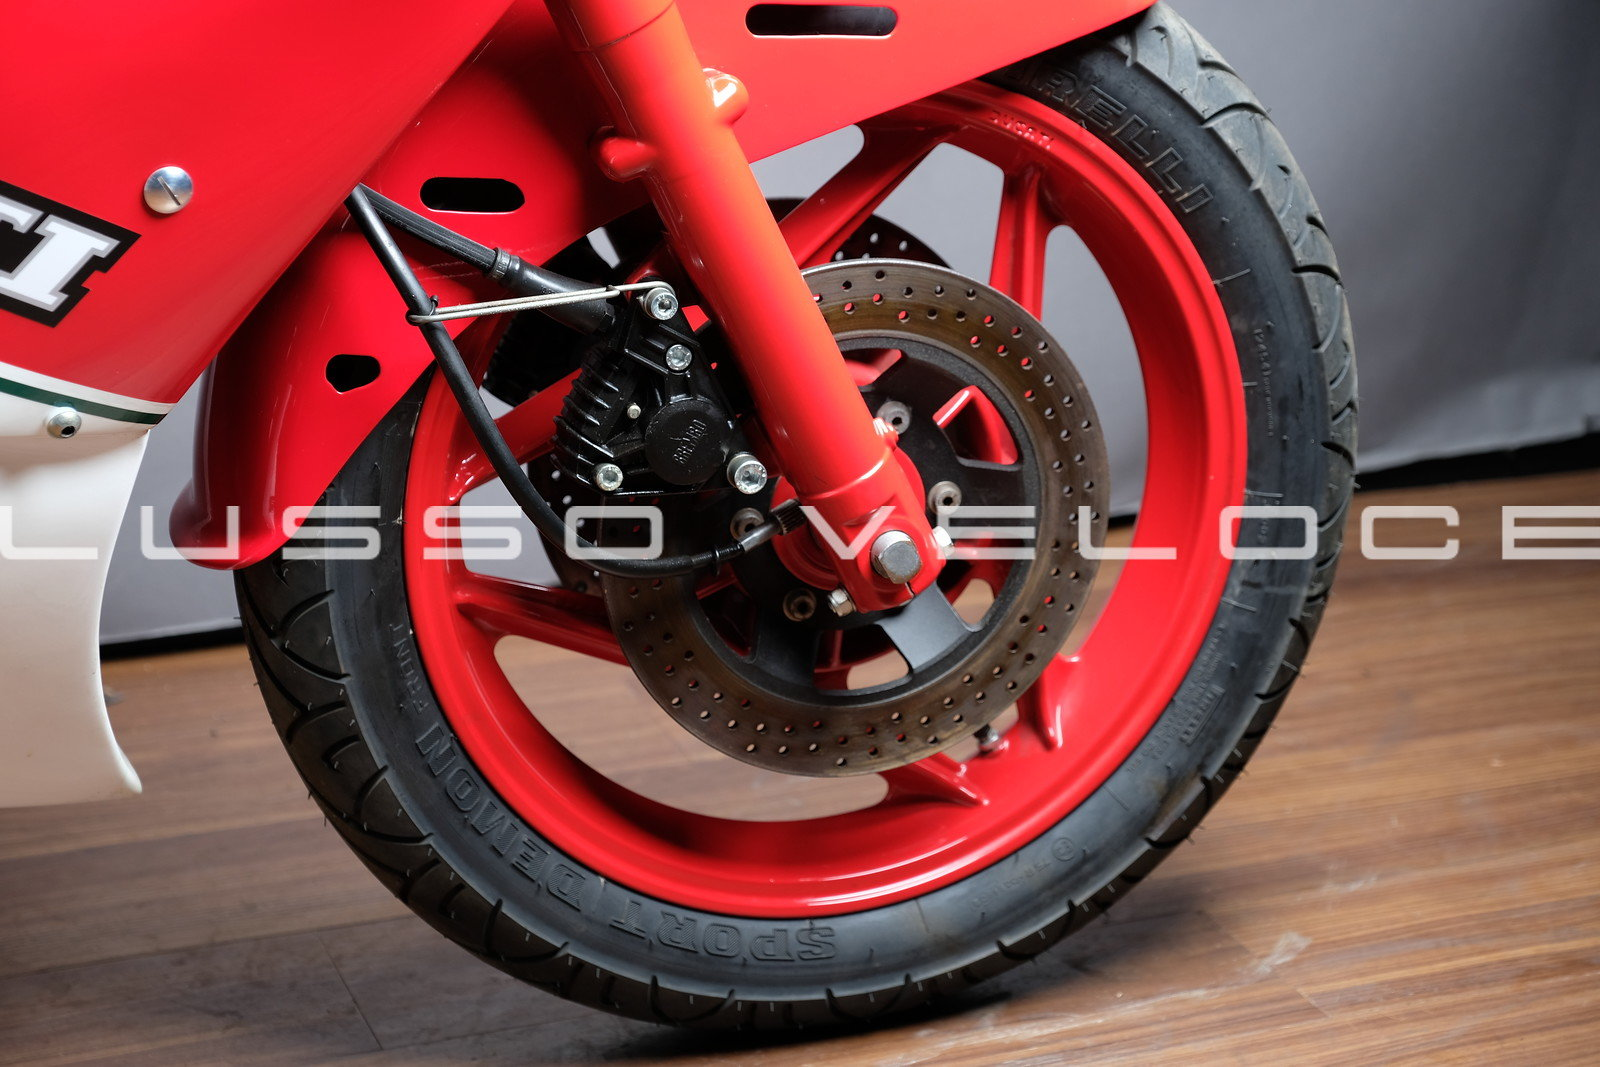 1986 Rare Ducati F3 350 fully restored For Sale (picture 5 of 15)